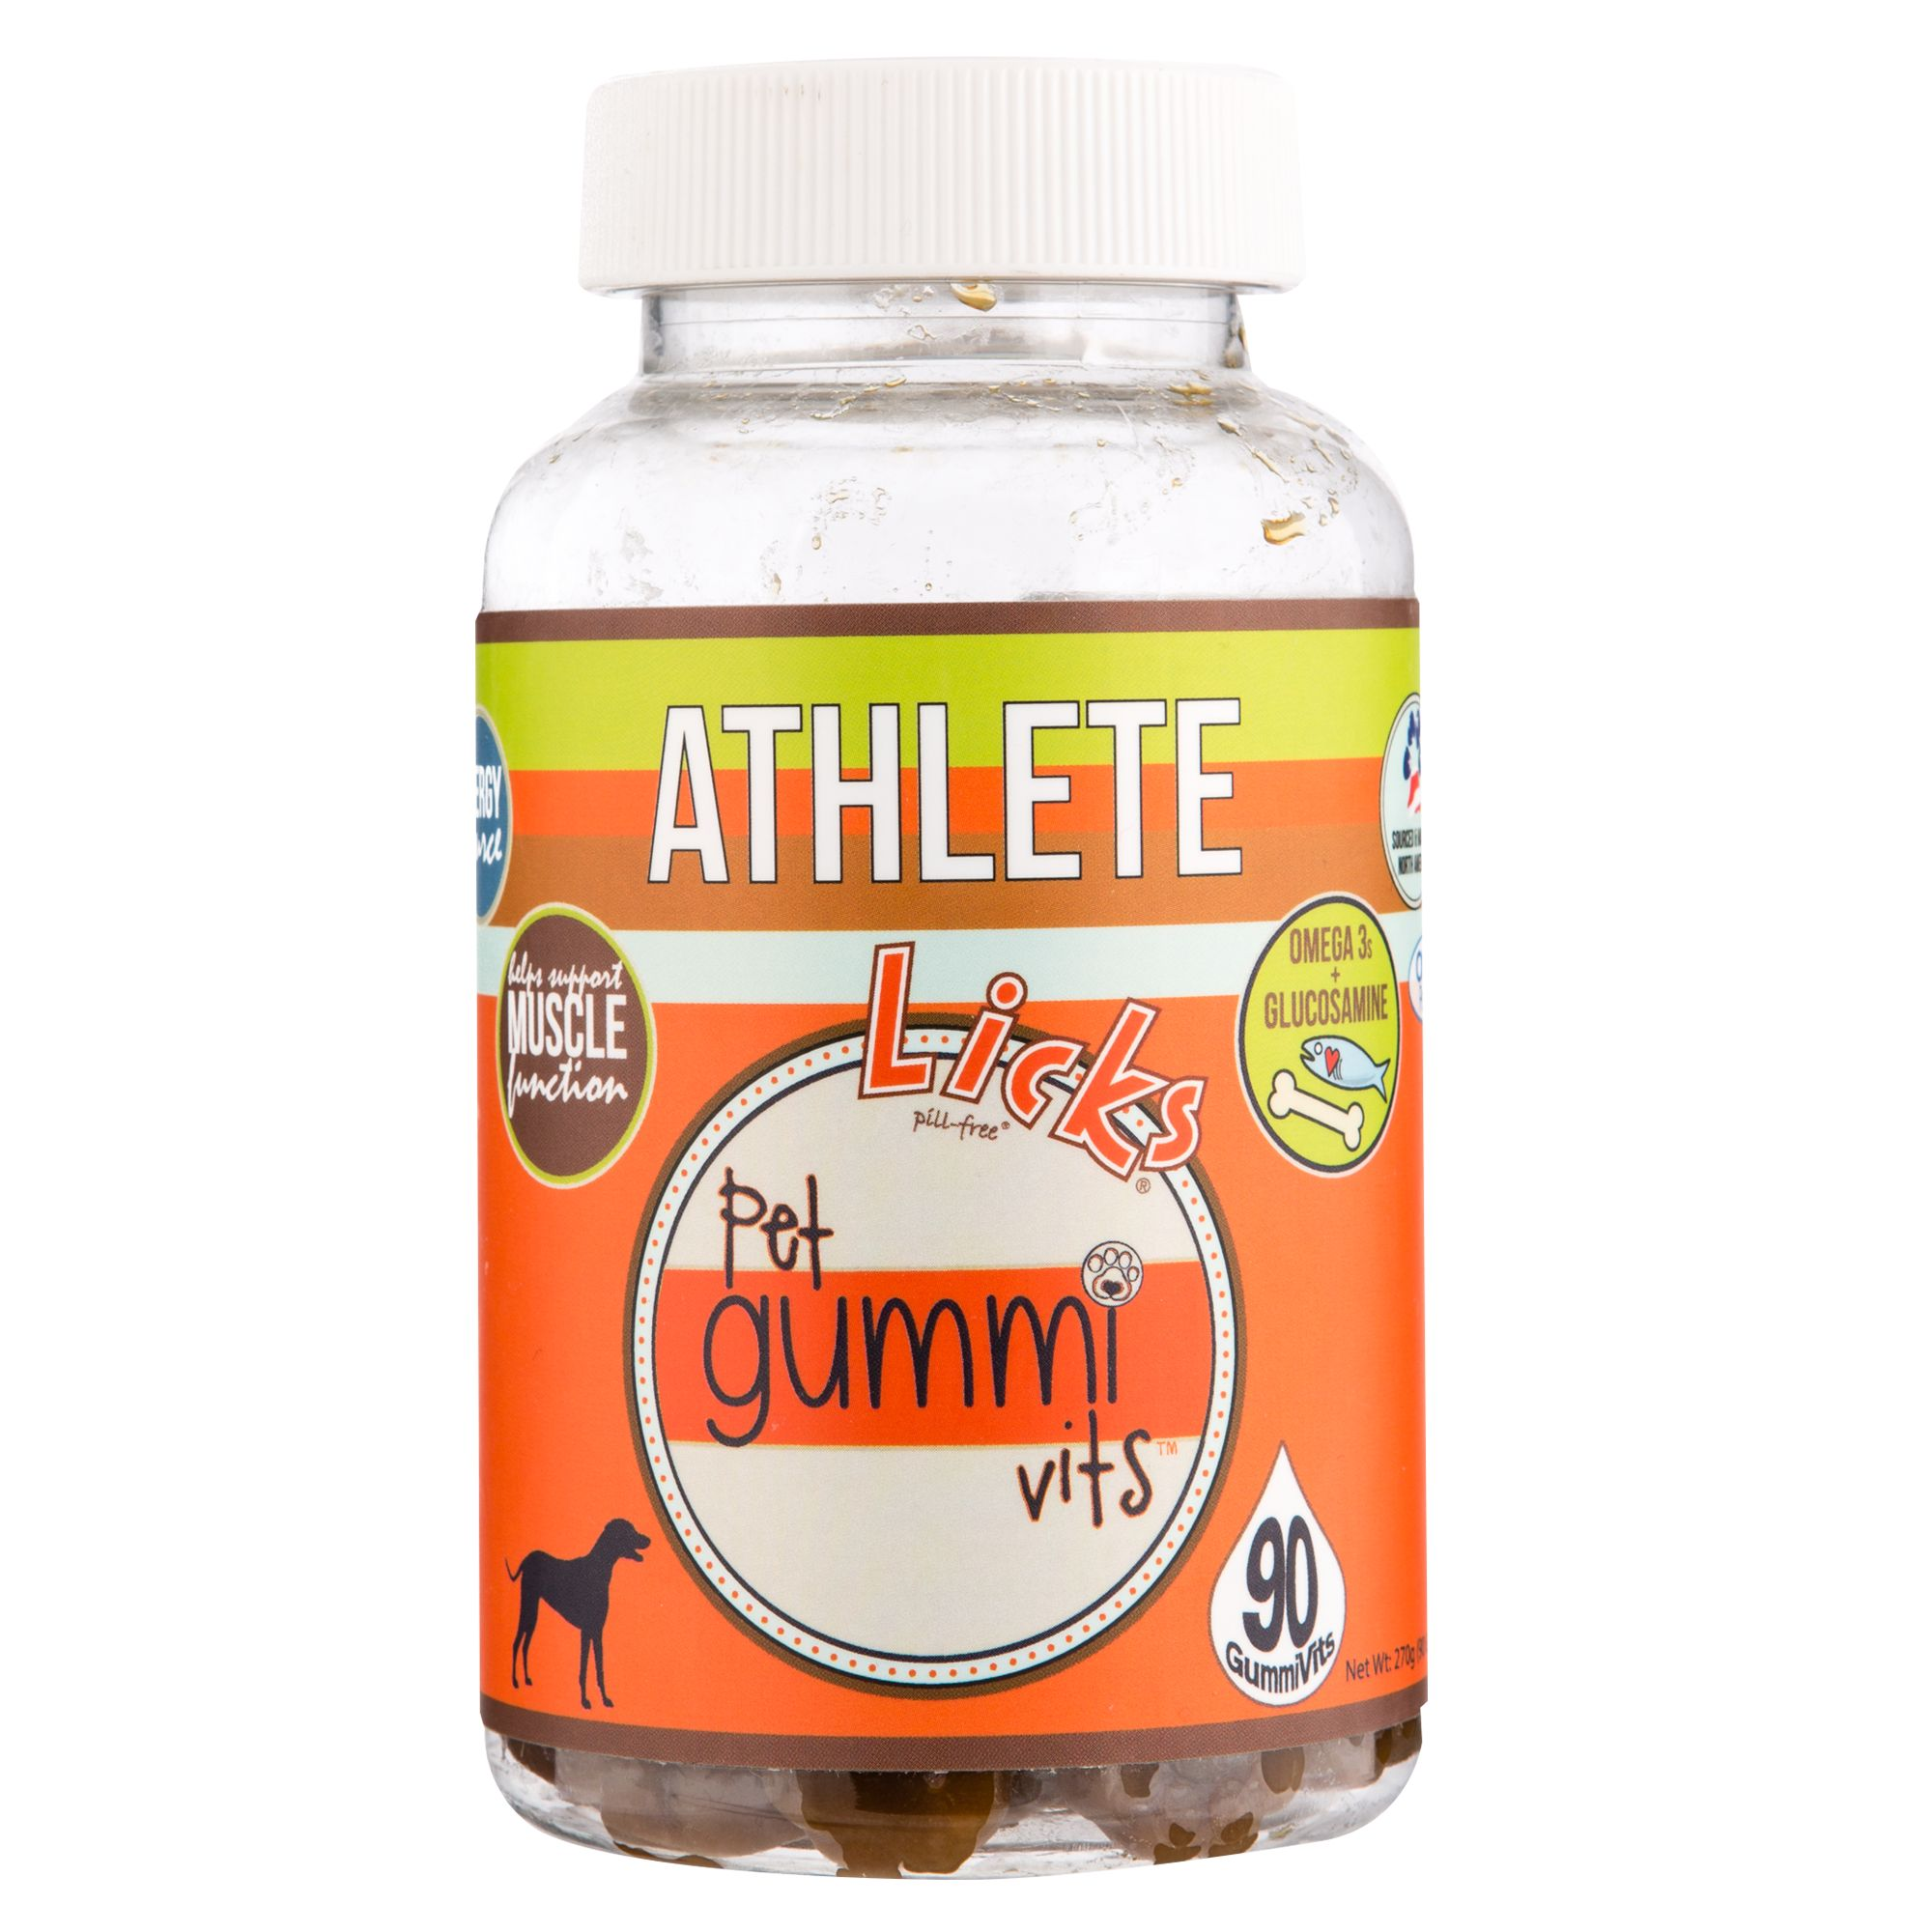 Licks Athlete Pet Gummi Vits Size 90 Count